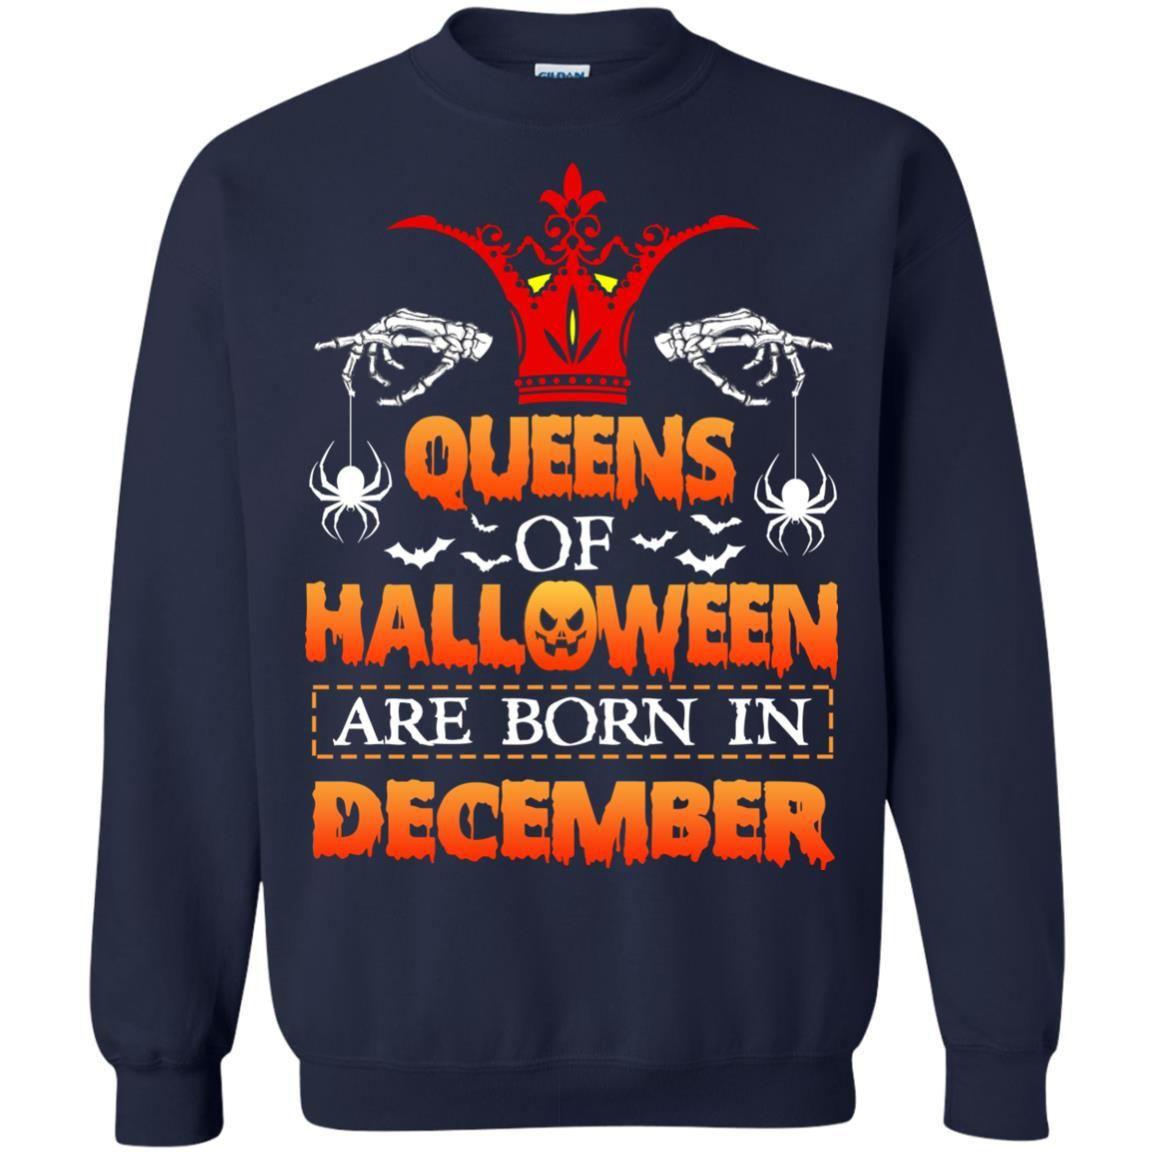 image 967 - Queens of Halloween are born in December shirt, tank top, hoodie